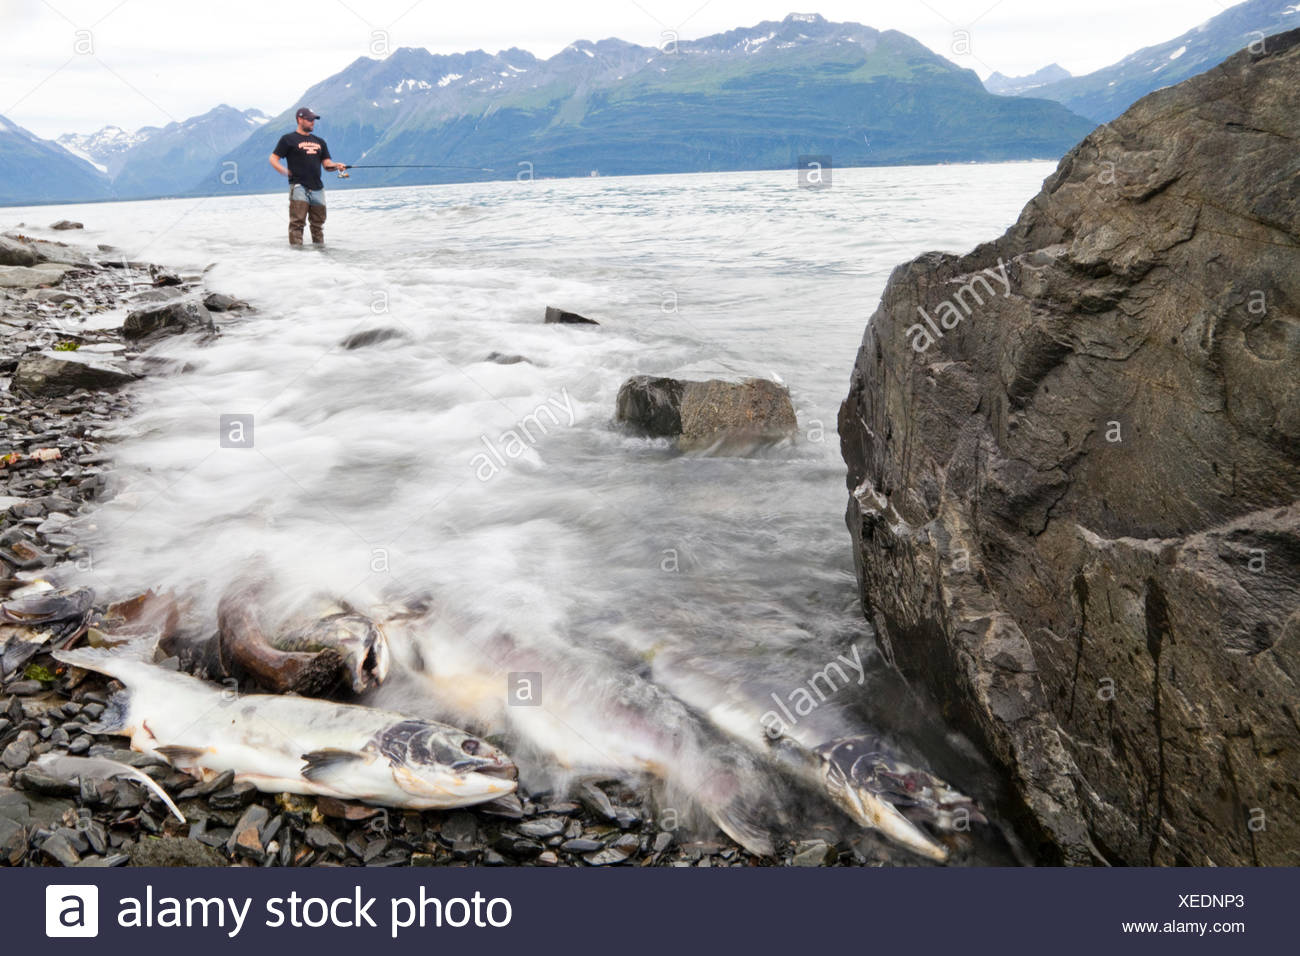 Pipeline animals stock photos pipeline animals stock for Salmon fishing bay area